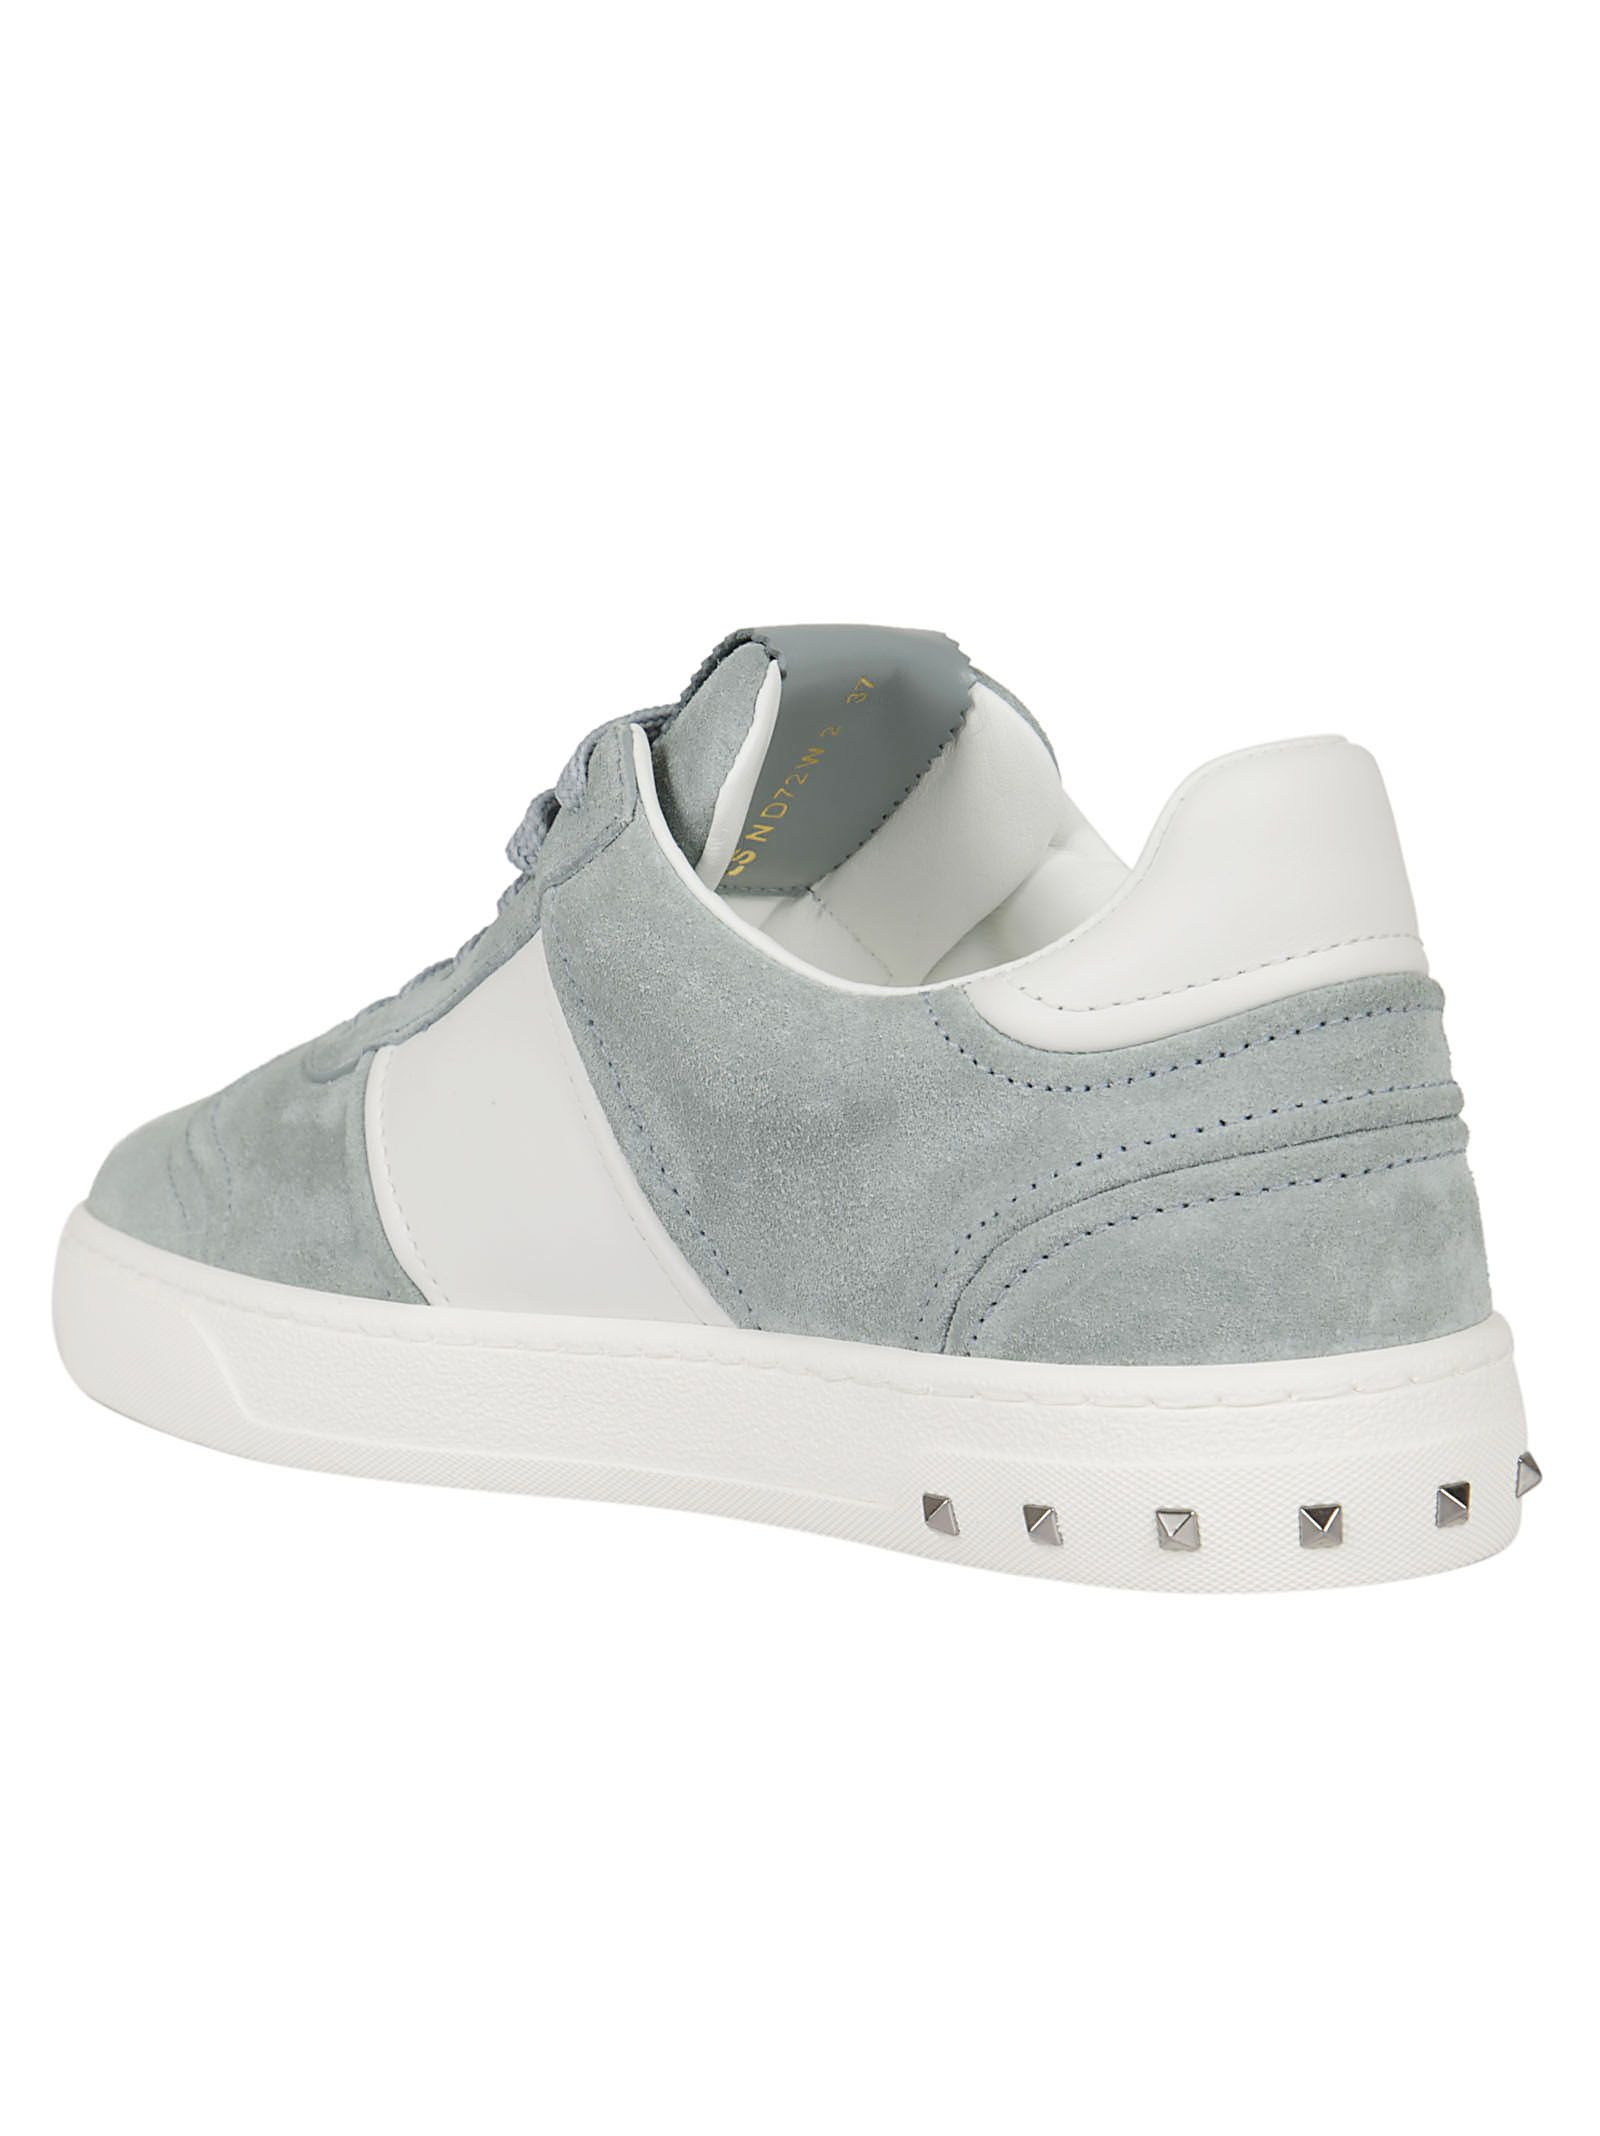 Valentino Garavani - Valentino Garavani Flycrew Sneakers - Grey, Women's Sneakers | Italist